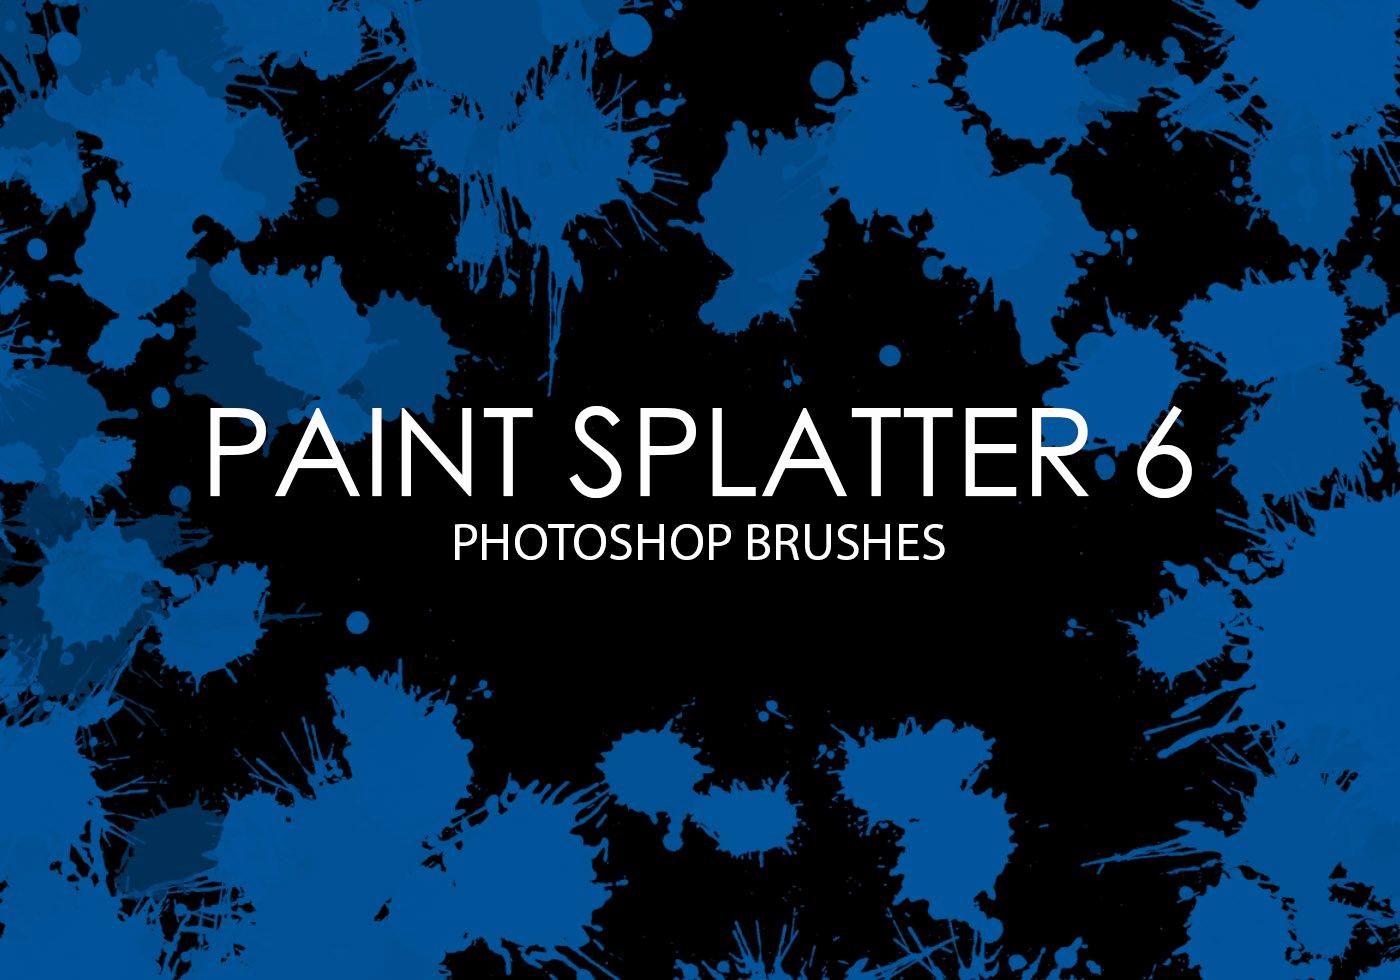 Paint Splatter Brush Photoshop Beautiful Free Paint Splatter Shop Brushes 6 Free Shop